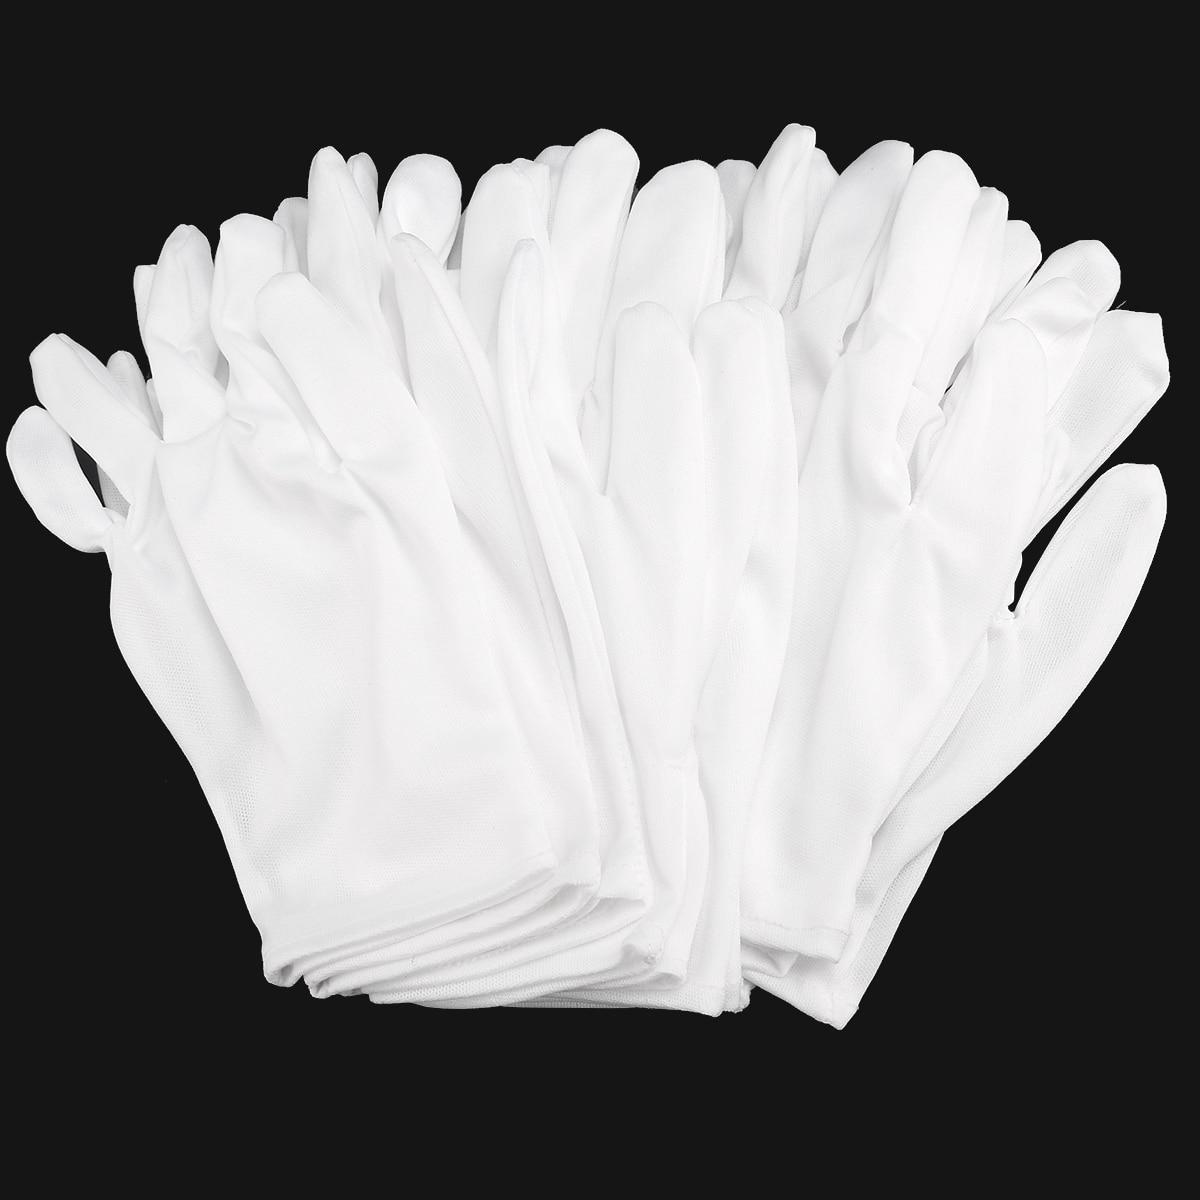 MUSEYA 8pairs/set Lightweight Nylon Protective Glove Film Handling Gloves Working Mittens